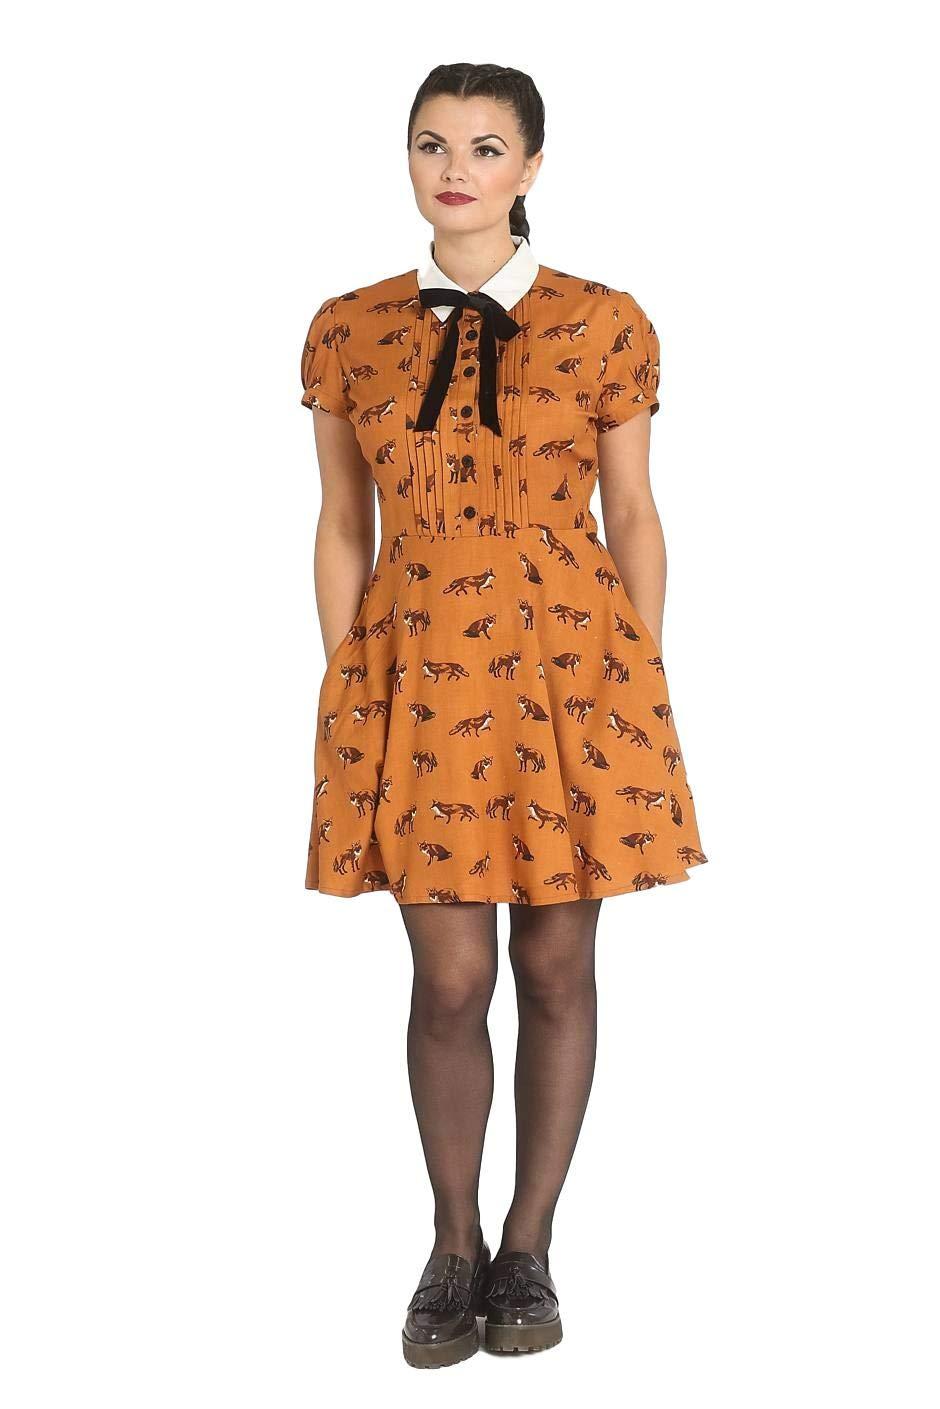 Available at Amazon: Hell-Bunny Vixey 1960s Fox Print Vintage Retro Style Short Dress XS-4XL